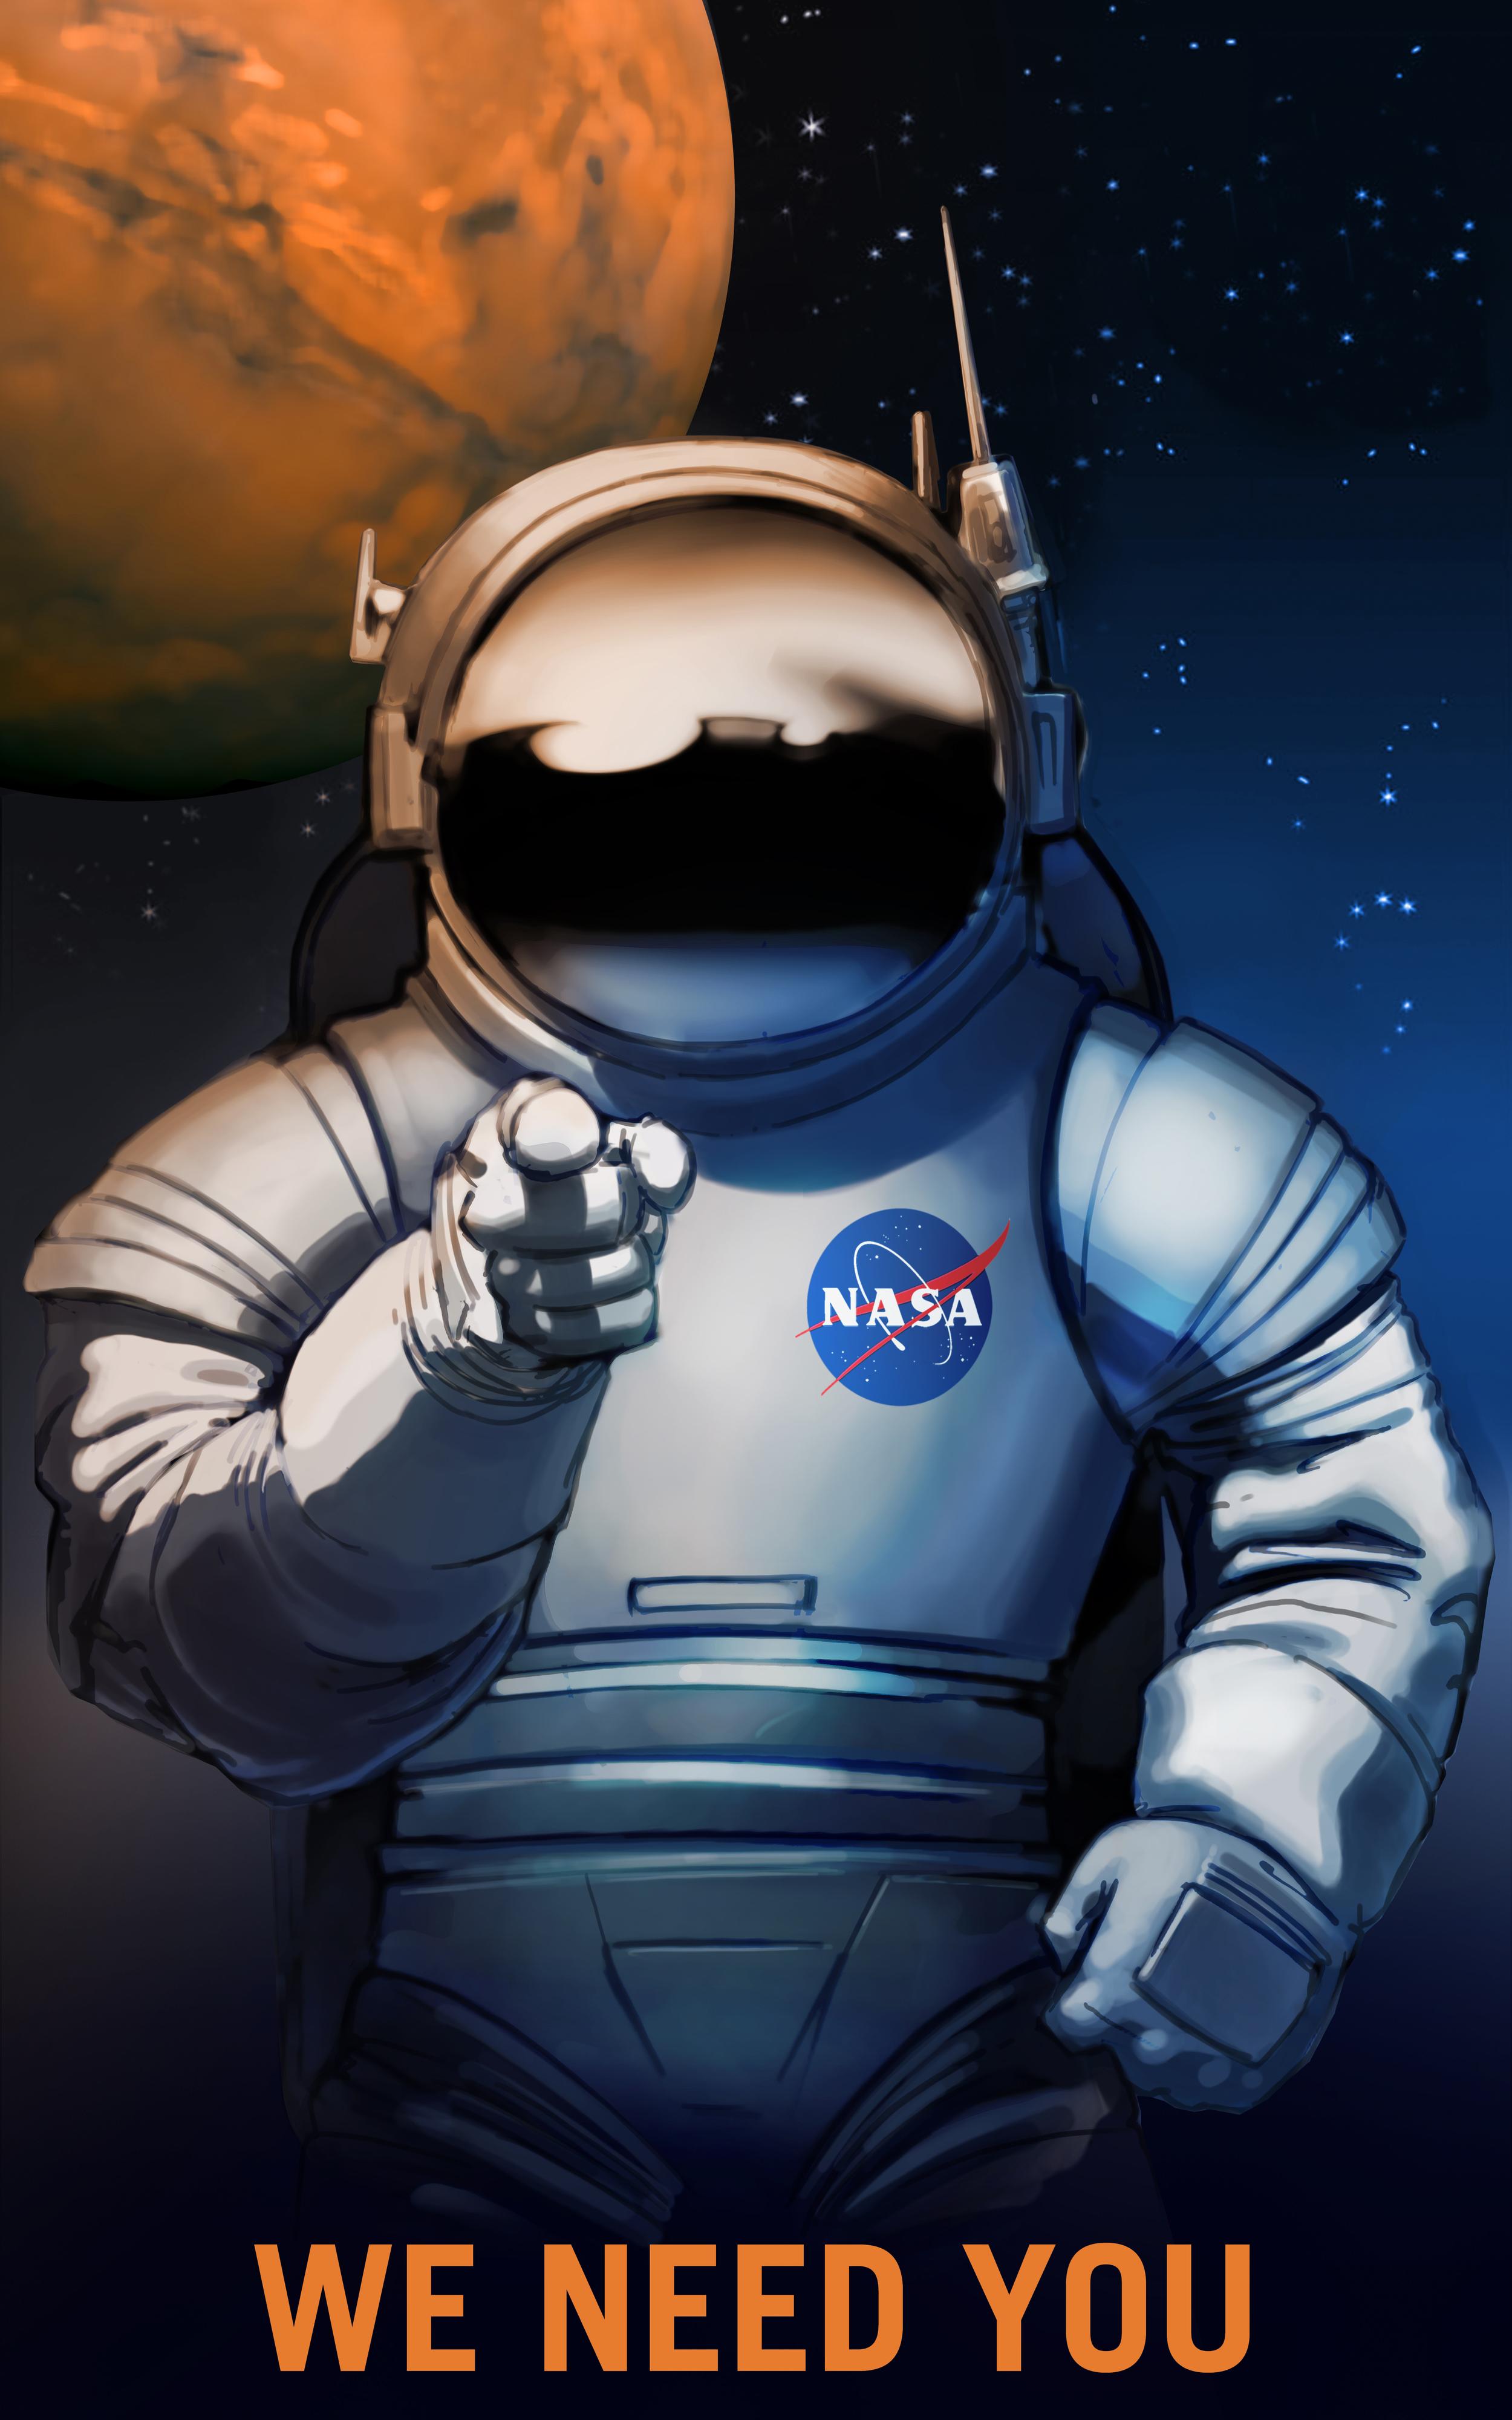 NASA recruiting poster.